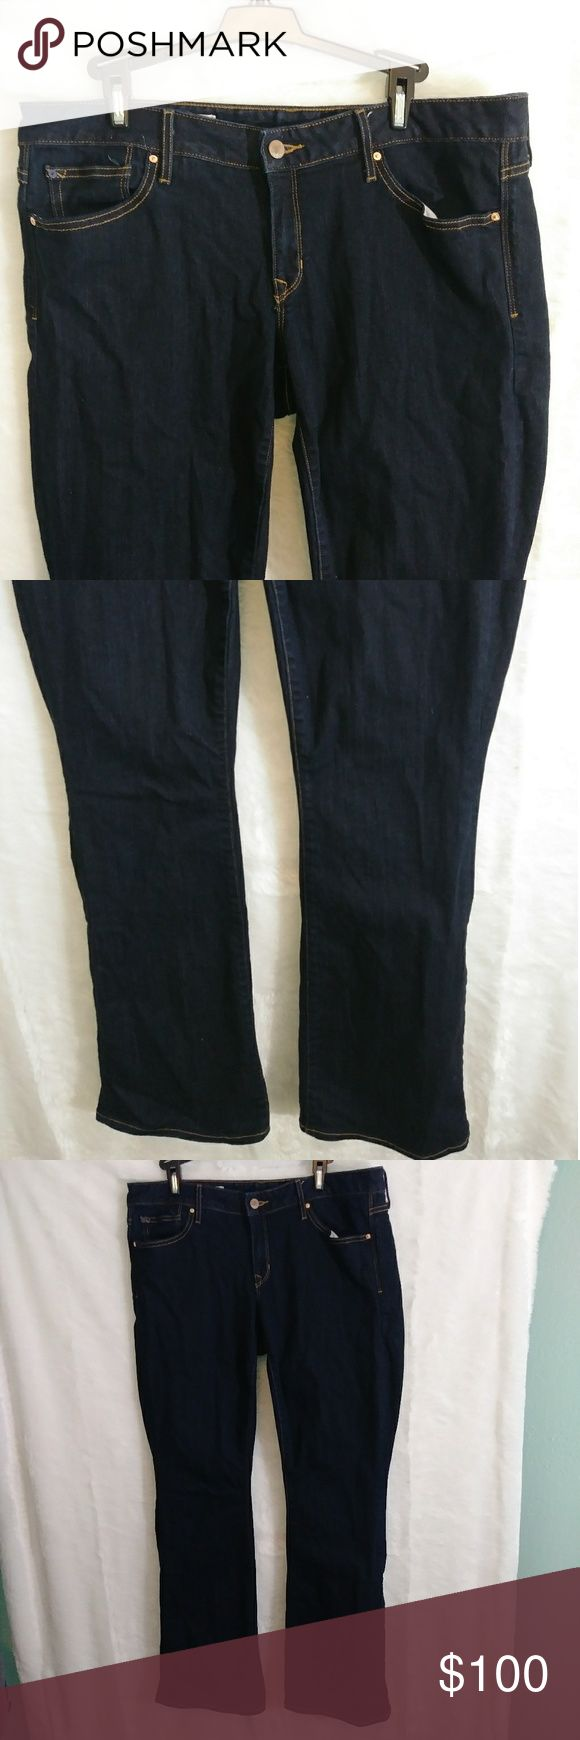 Gap Curvy Jeans Brand: Gap 1969 Size: 32r GAP Jeans Boot Cut